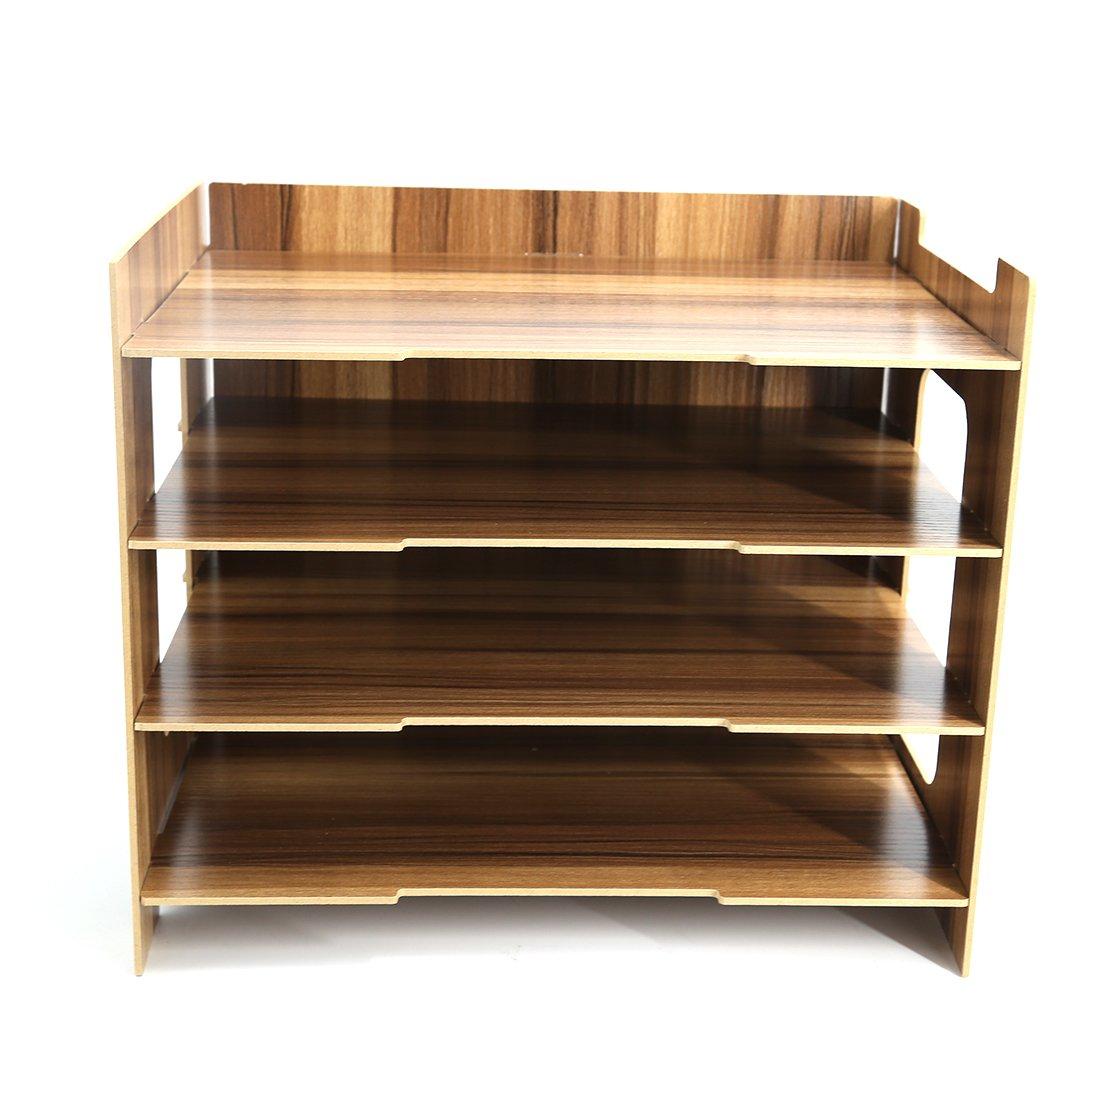 PeleusTech® 4 Layers Wood Storage Rack Durable Office Organization for File Desktop Organizer Shelf for Books Documents - (Dark Wood Grain)